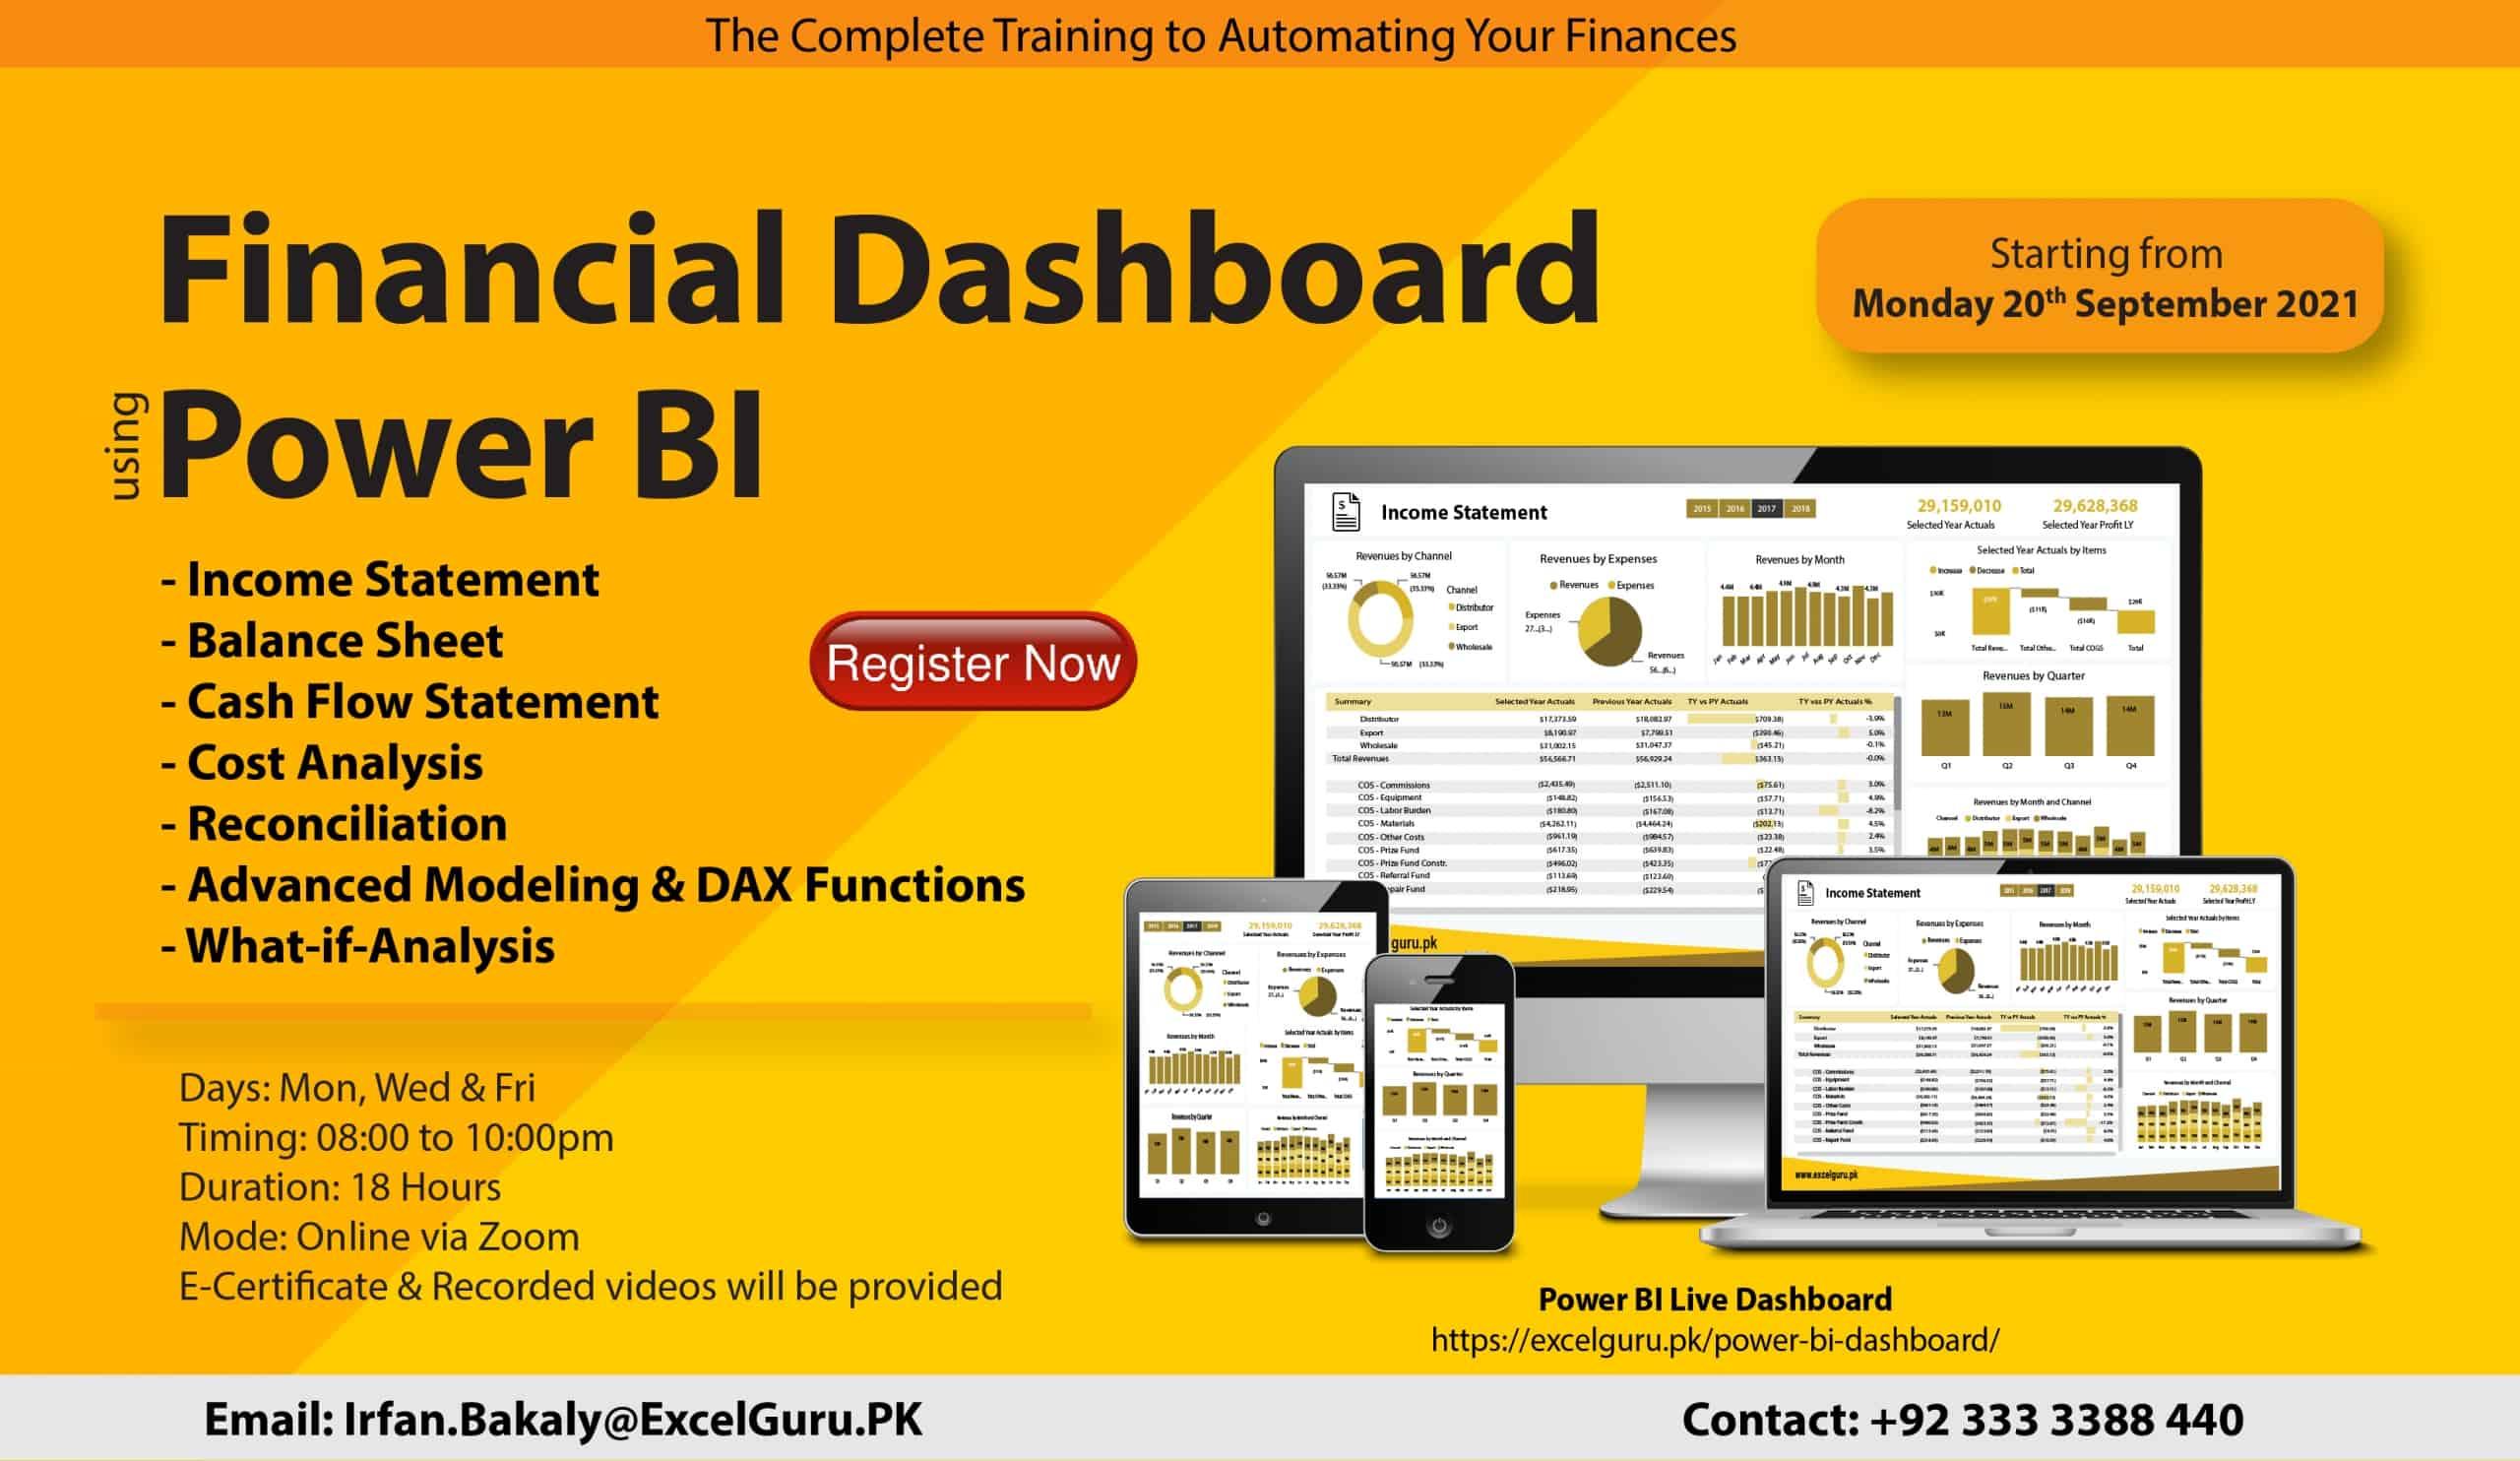 Financial Dashboard in Power BI - Sep 2021